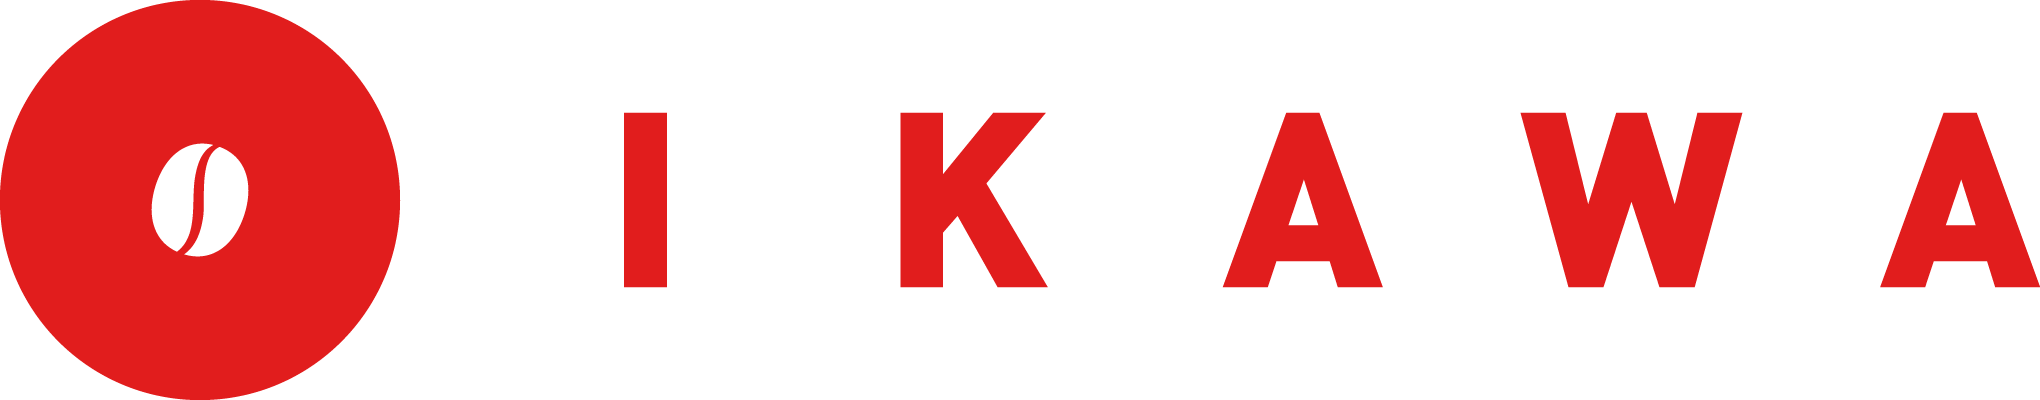 ikawa_red_logo.png